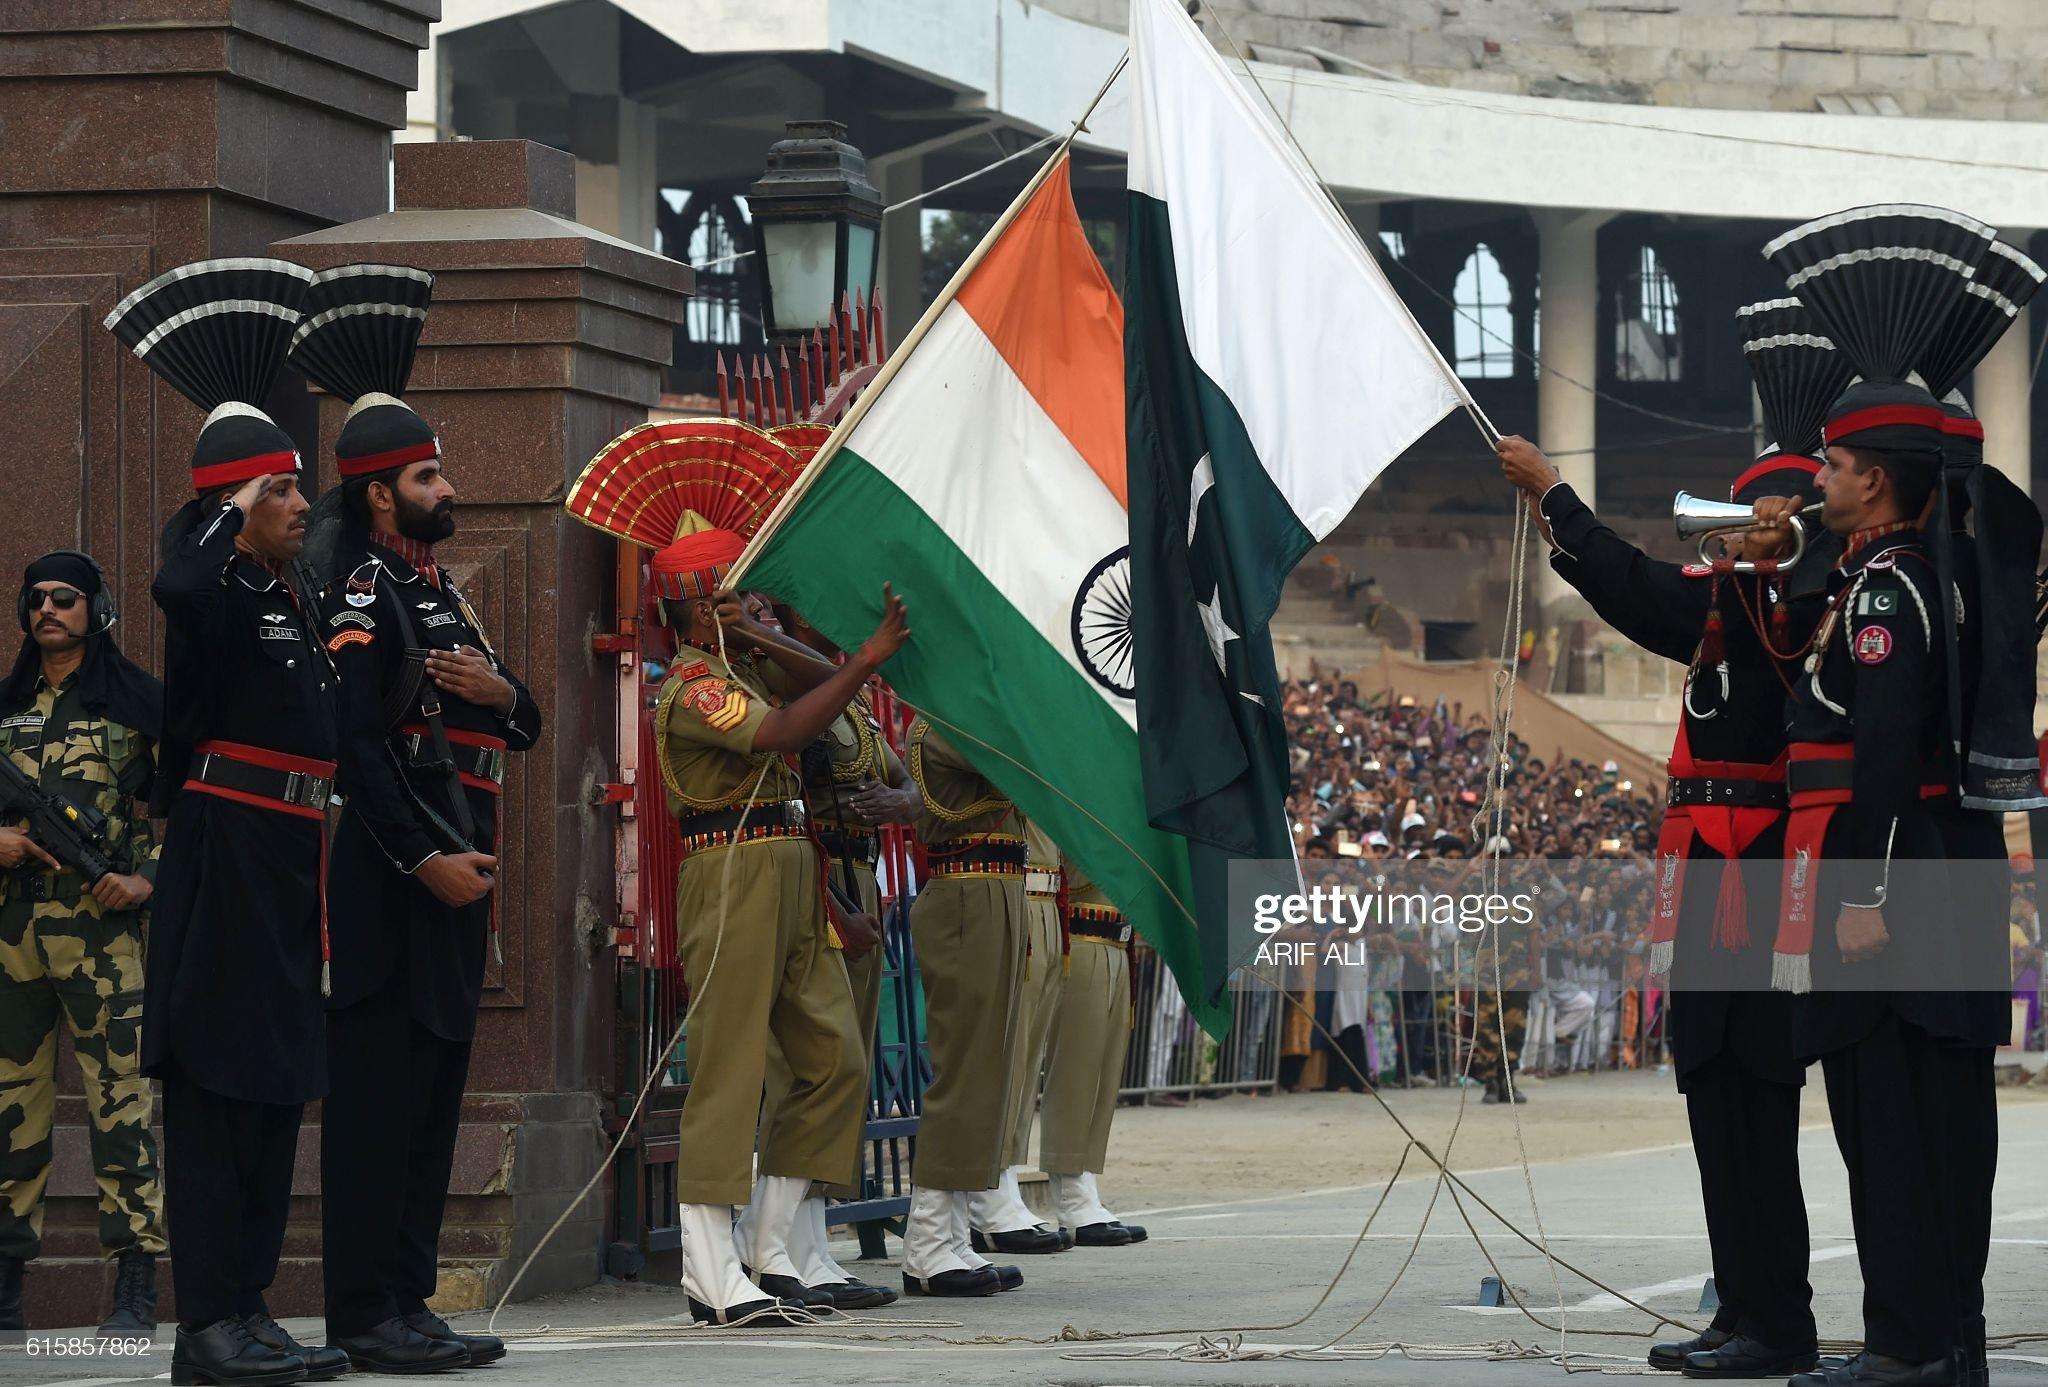 PAKISTAN-DEFENCE-SPORTS-PACES : News Photo